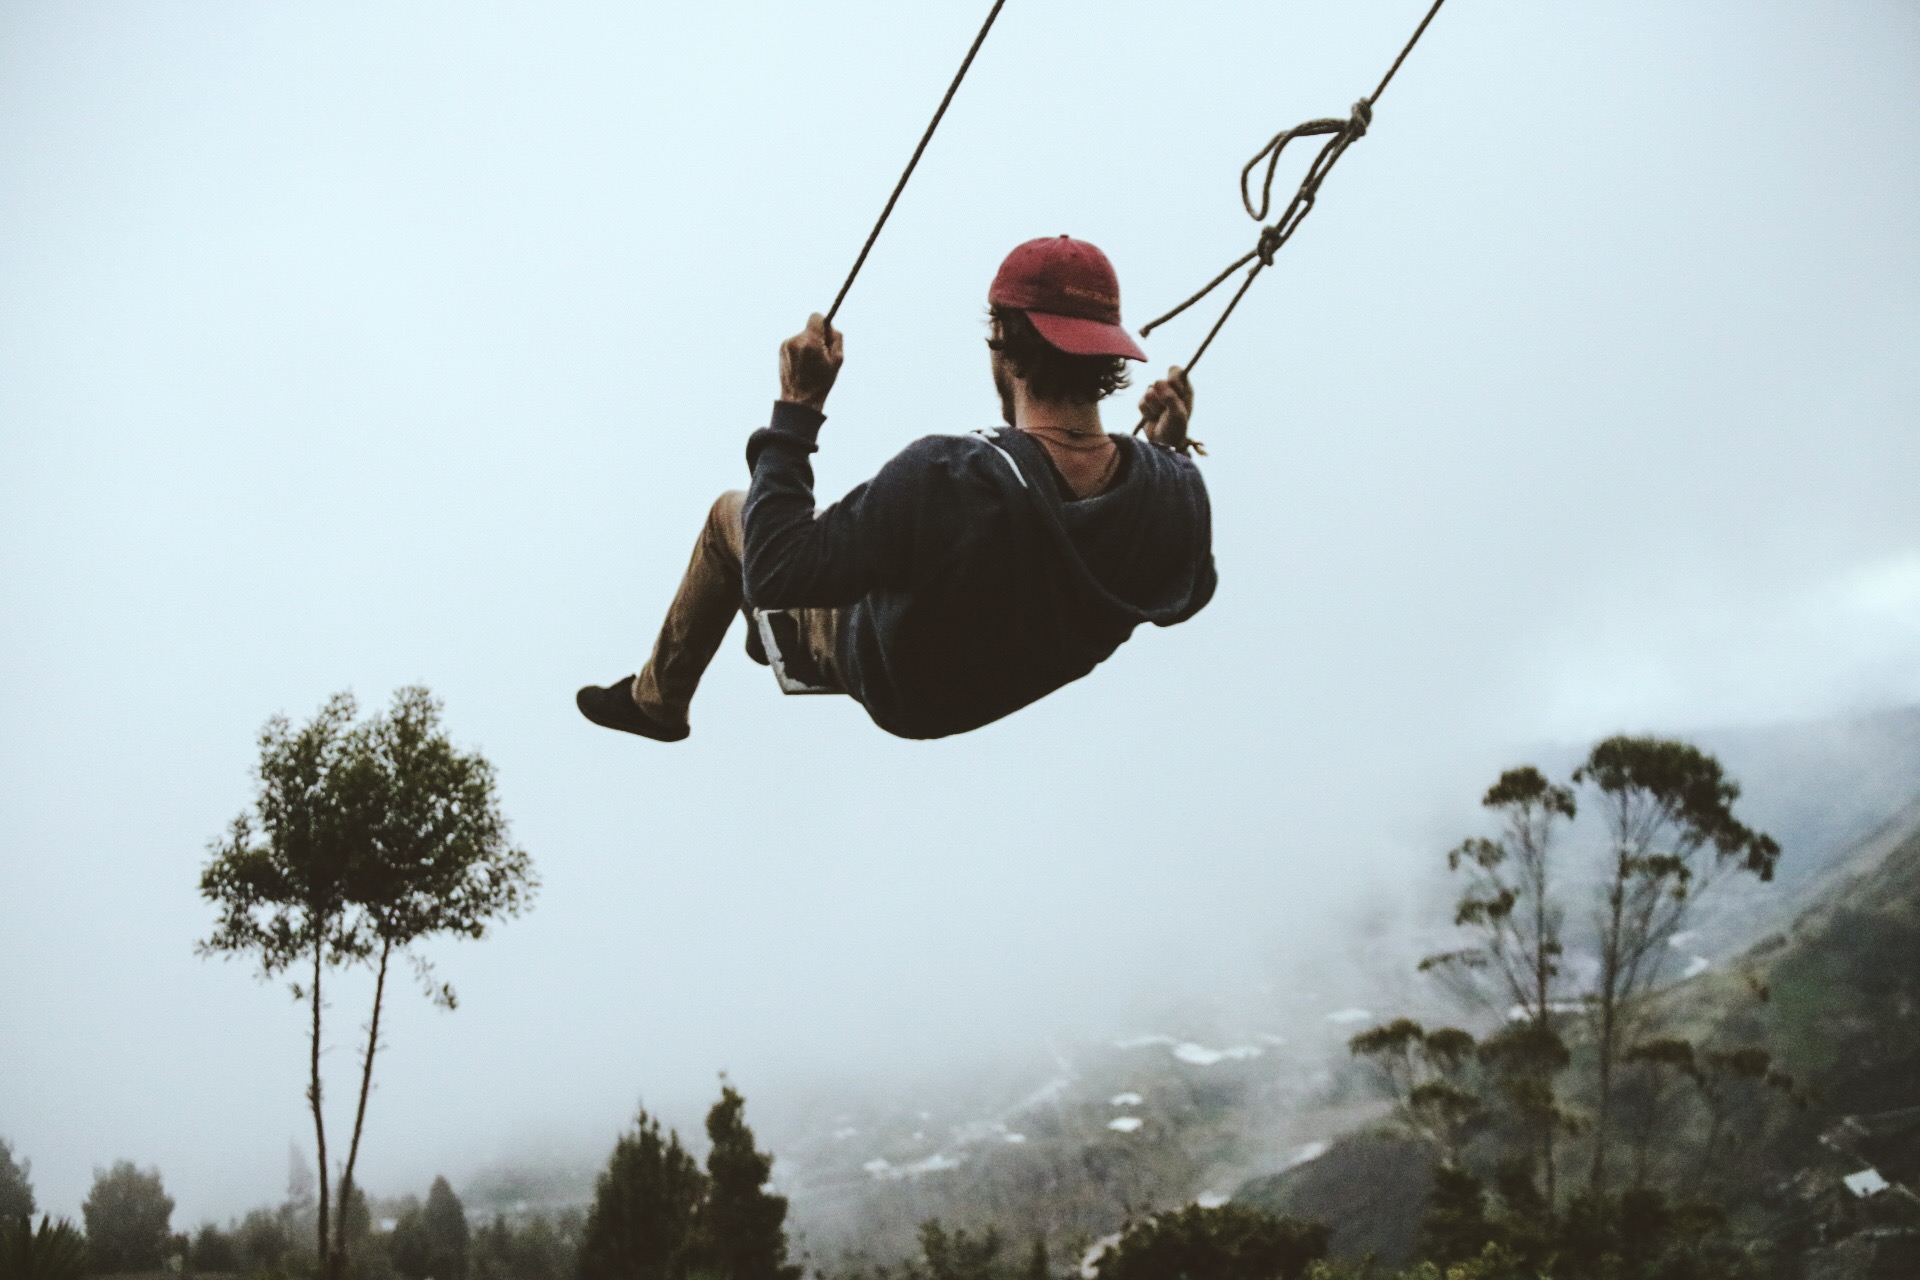 Trevor trying the swing!